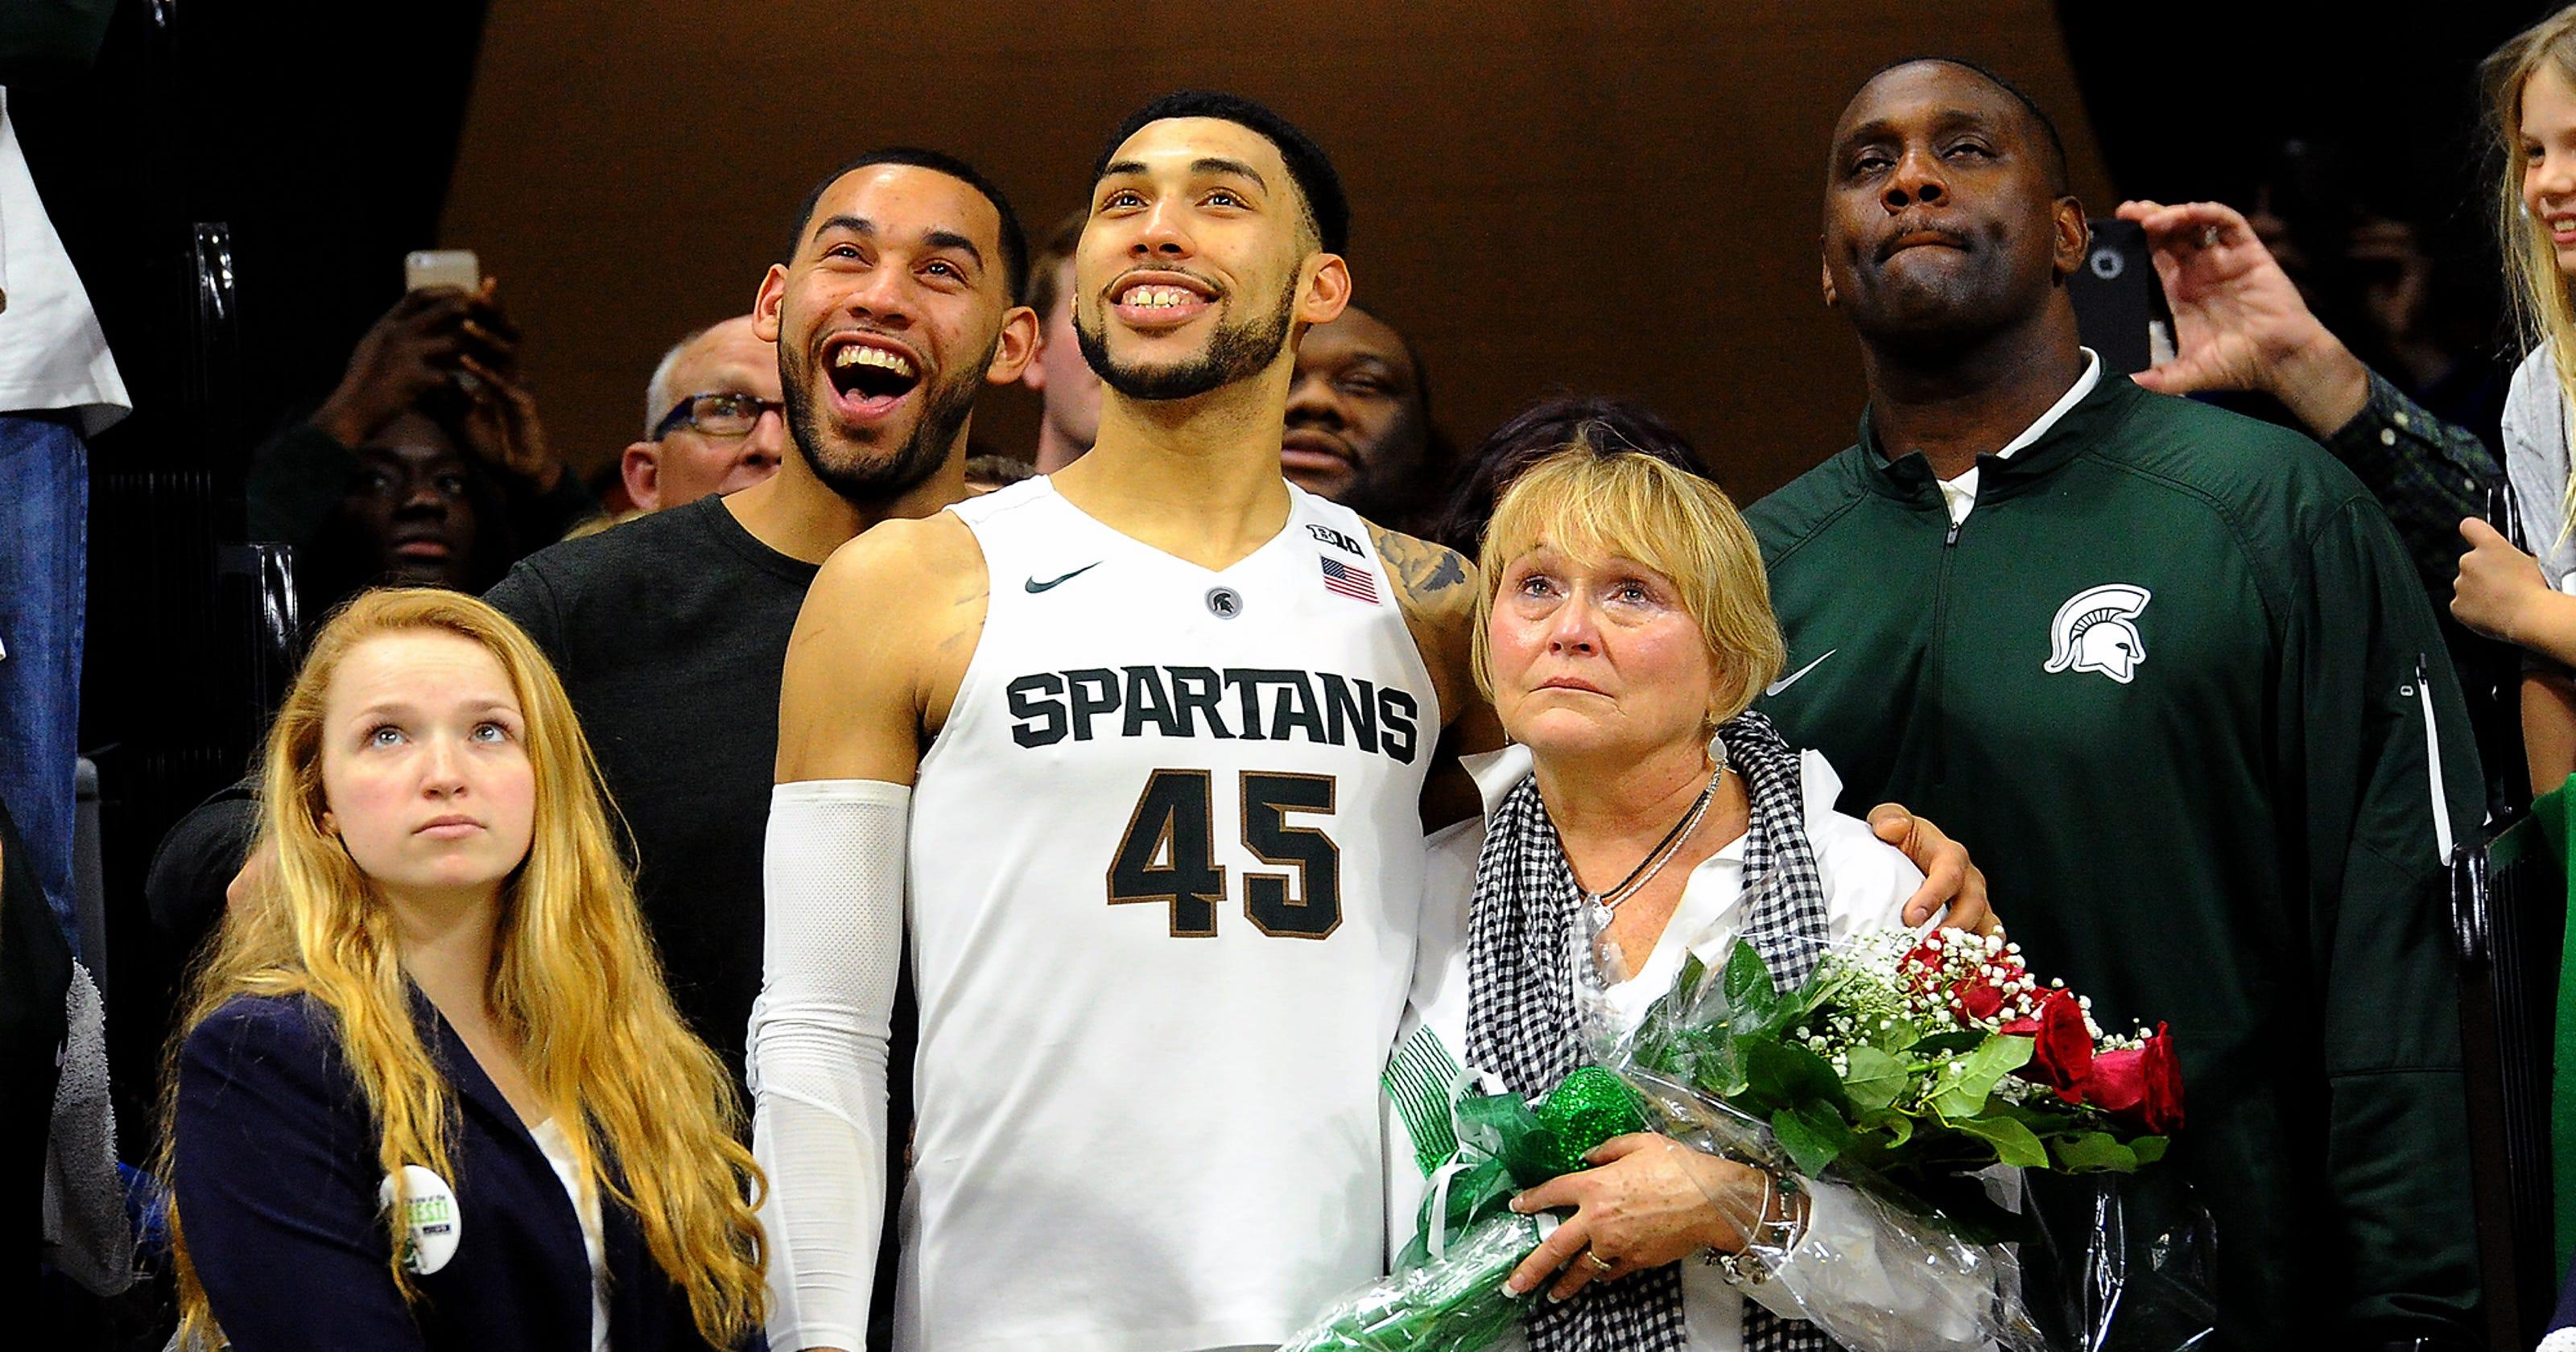 finest selection d6d32 94f63 Final Four: Former Michigan State, Sexton teammates reunite